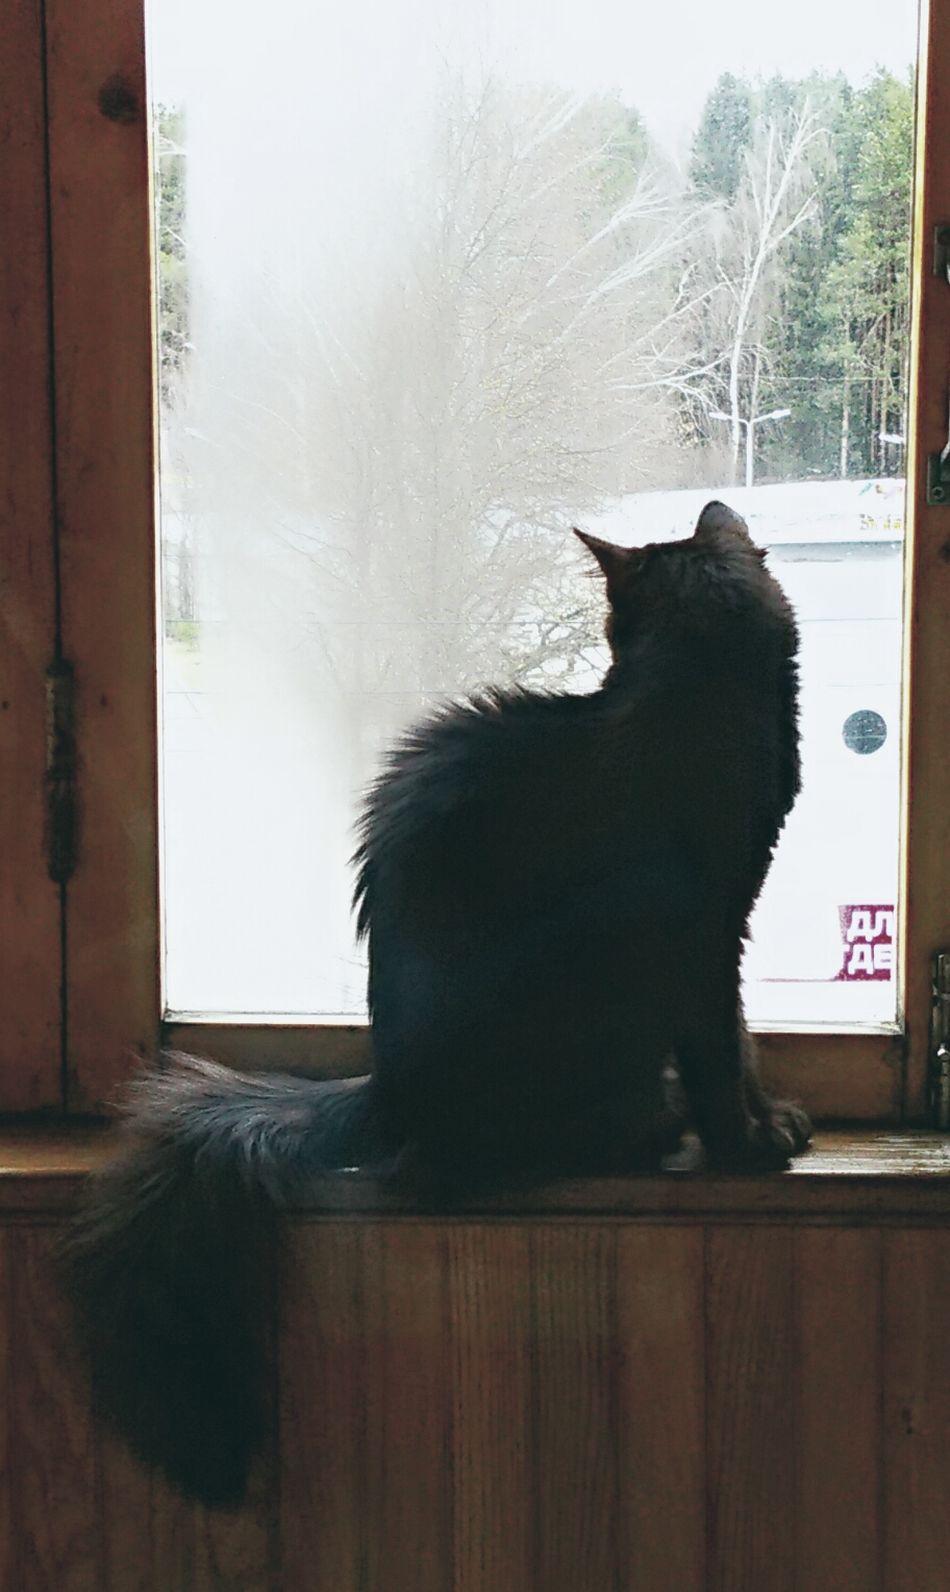 Cat I Love My Cats  One Cat 😻my Sweety Cat😻 😻😻😻❤️ Kitten 🐱 Cats 🐱 Cat Photography Beatiful Cat Black Cat Is Just So Beautiful. Cat♡ I Love My Cat Black Cat Animal One Animal I LOVE PHOTOGRAPHY Animal Themes